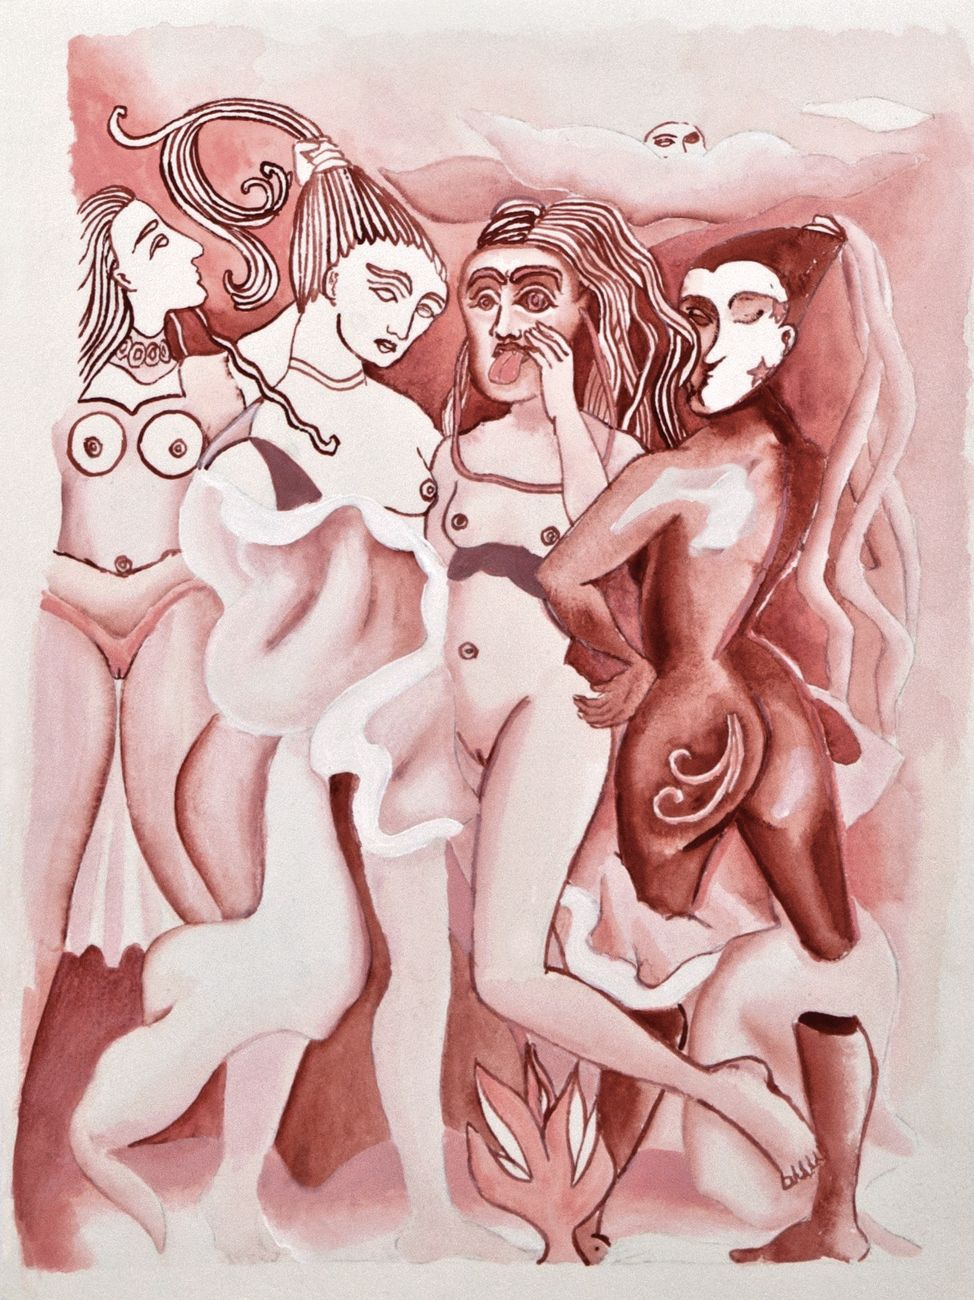 "Viola Leddi, Preparatory sketch for the painting ""Capricci"", 2018, acrylic on paper, 33 x 24 cm"